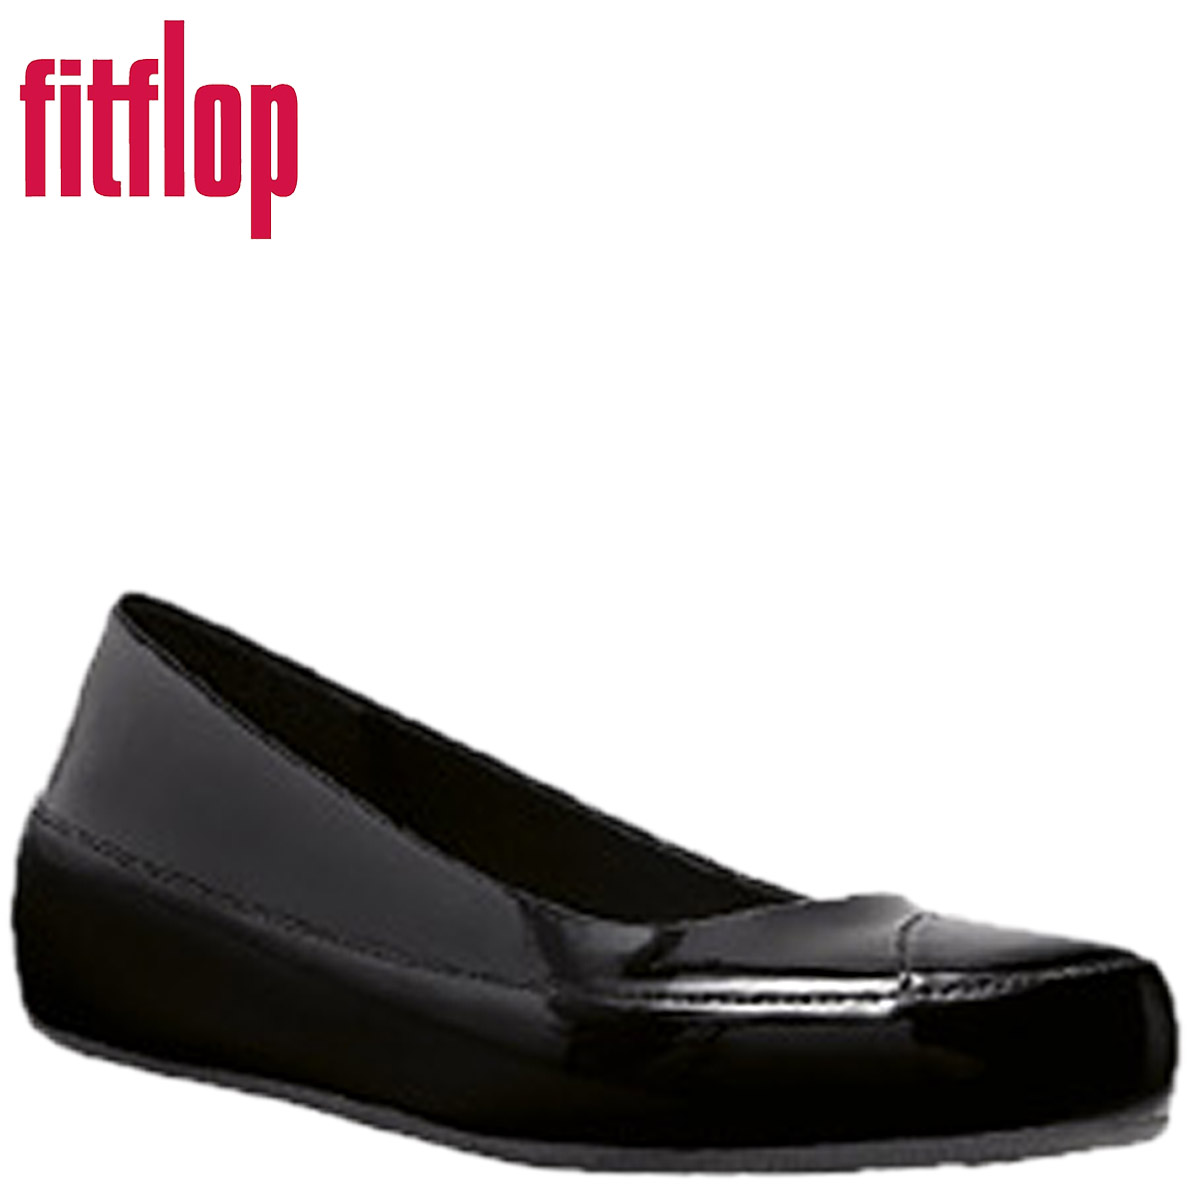 b6102f23bf402 SneaK Online Shop  All black fit flops FitFlop women s DUE PATENT ...